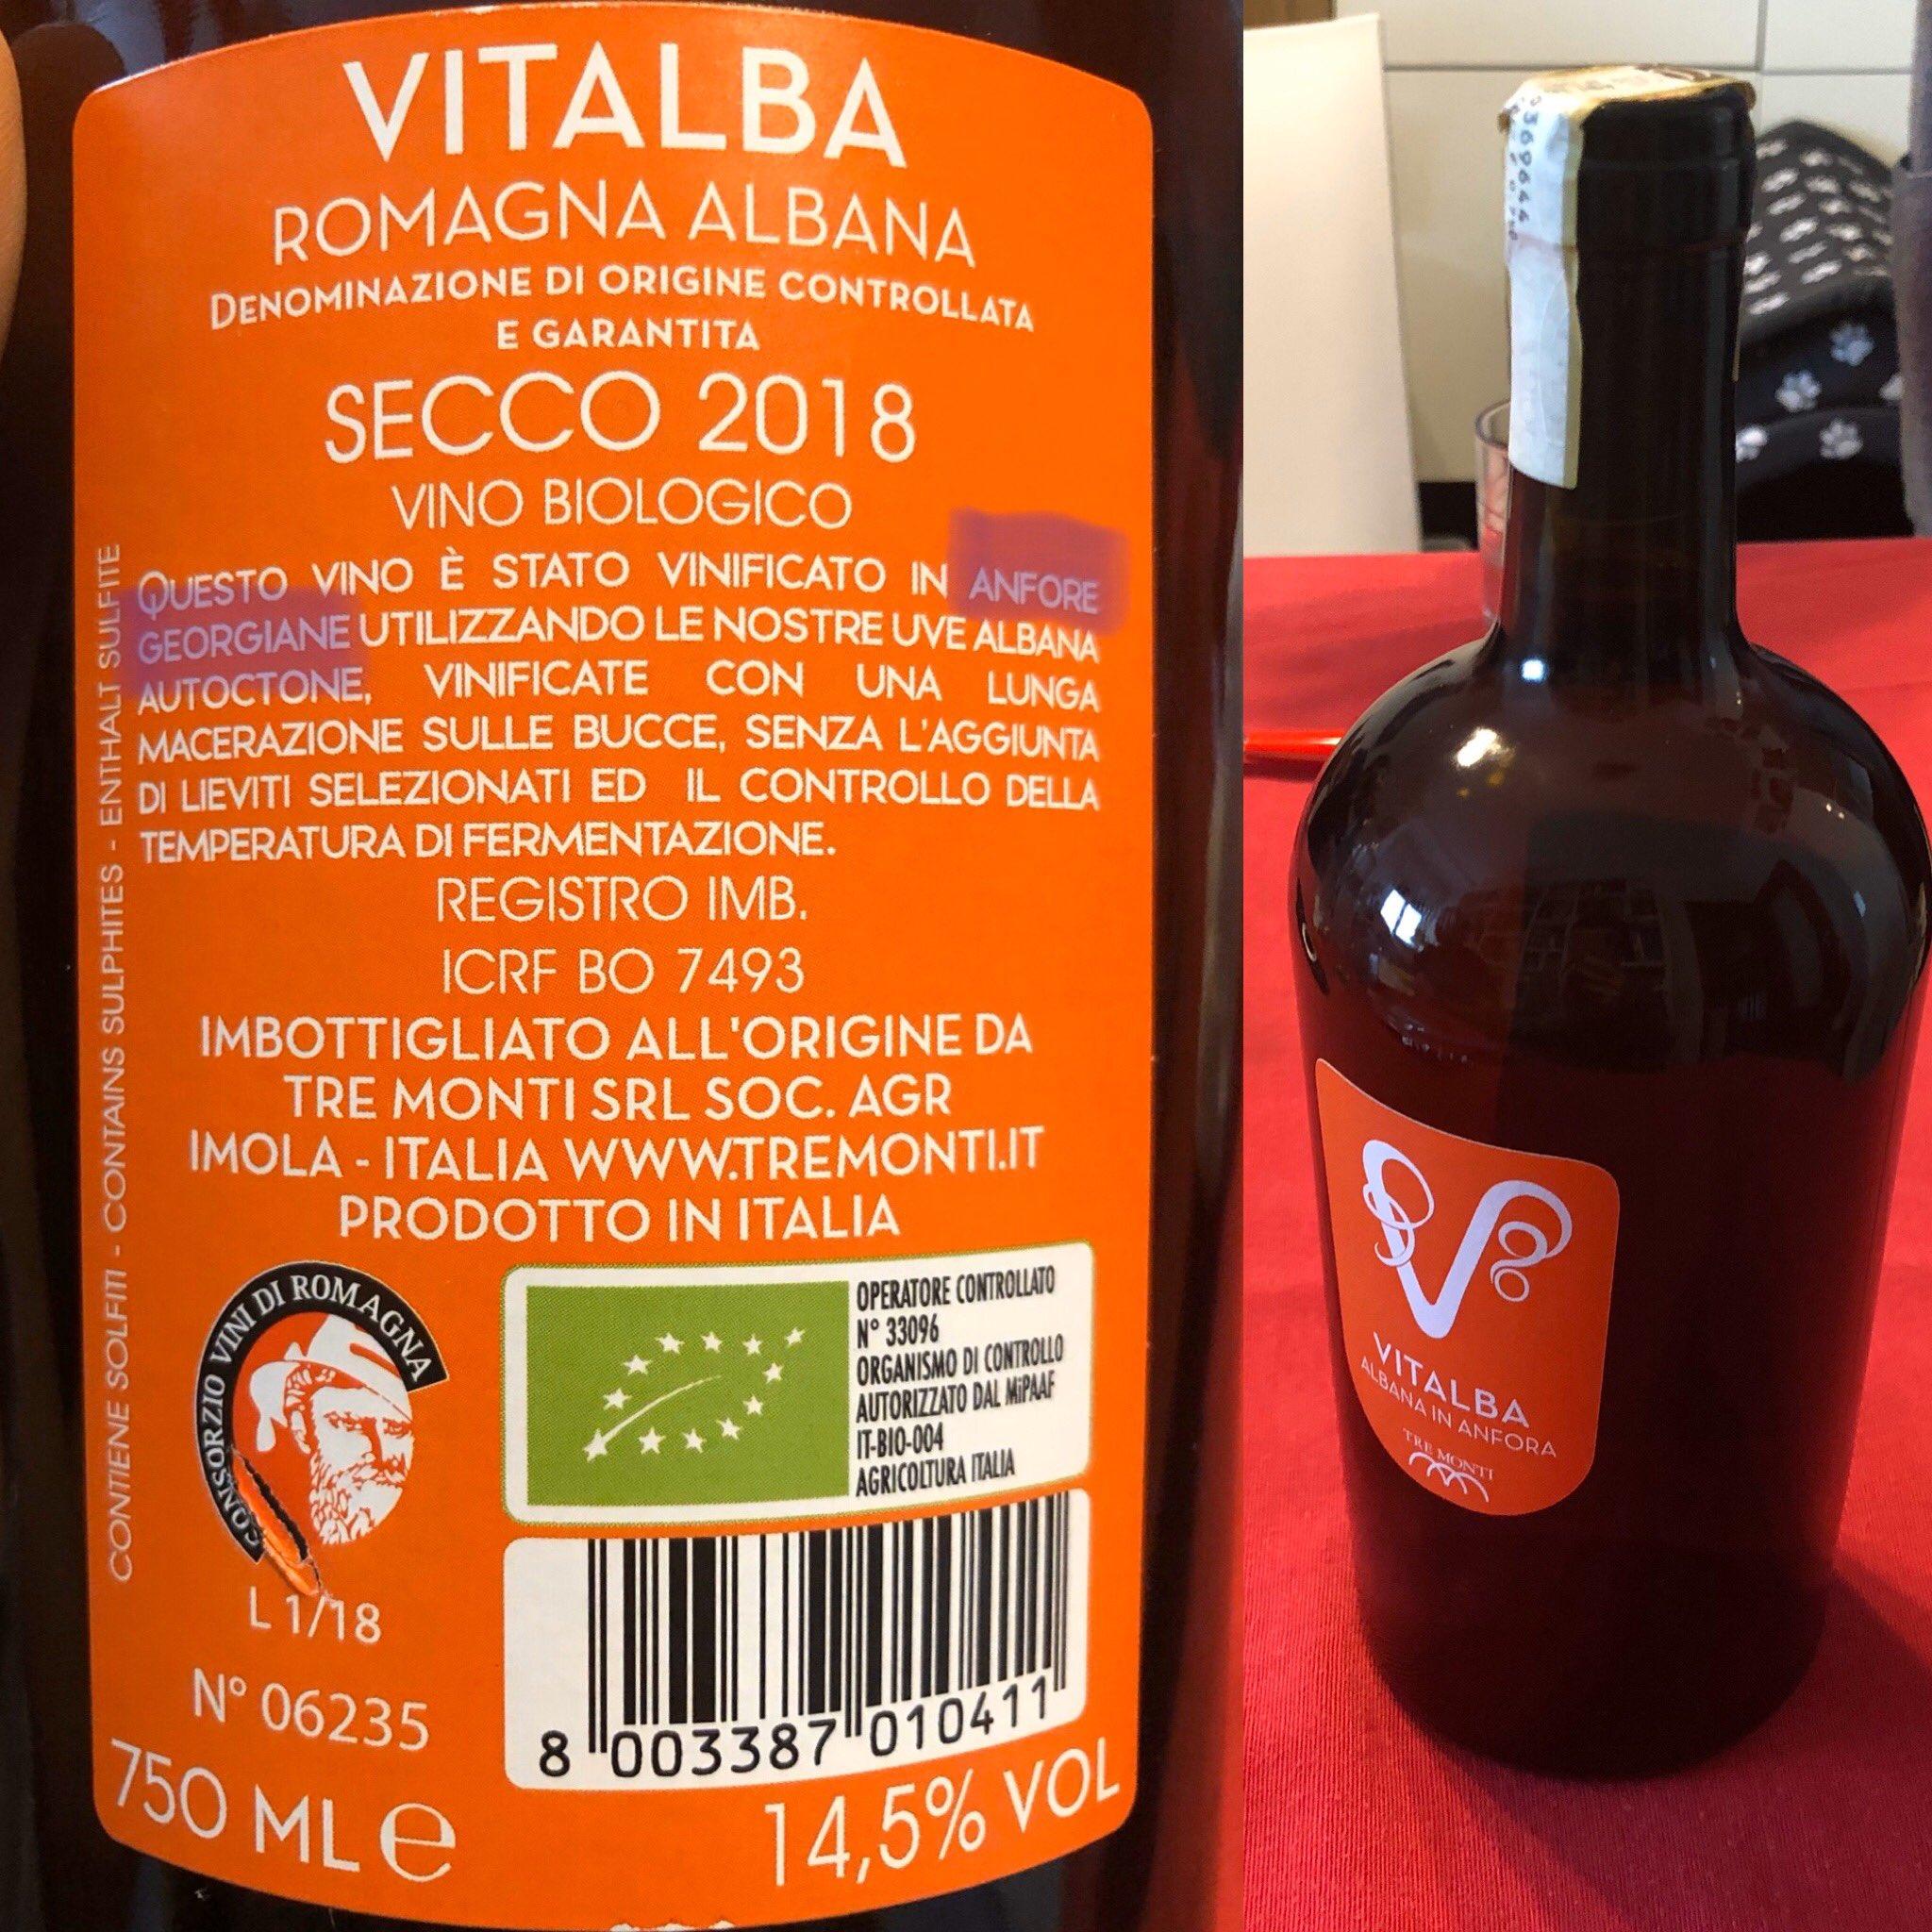 "All Origine Imola dr. zara bagdasarian on twitter: ""italian wine prepared in"